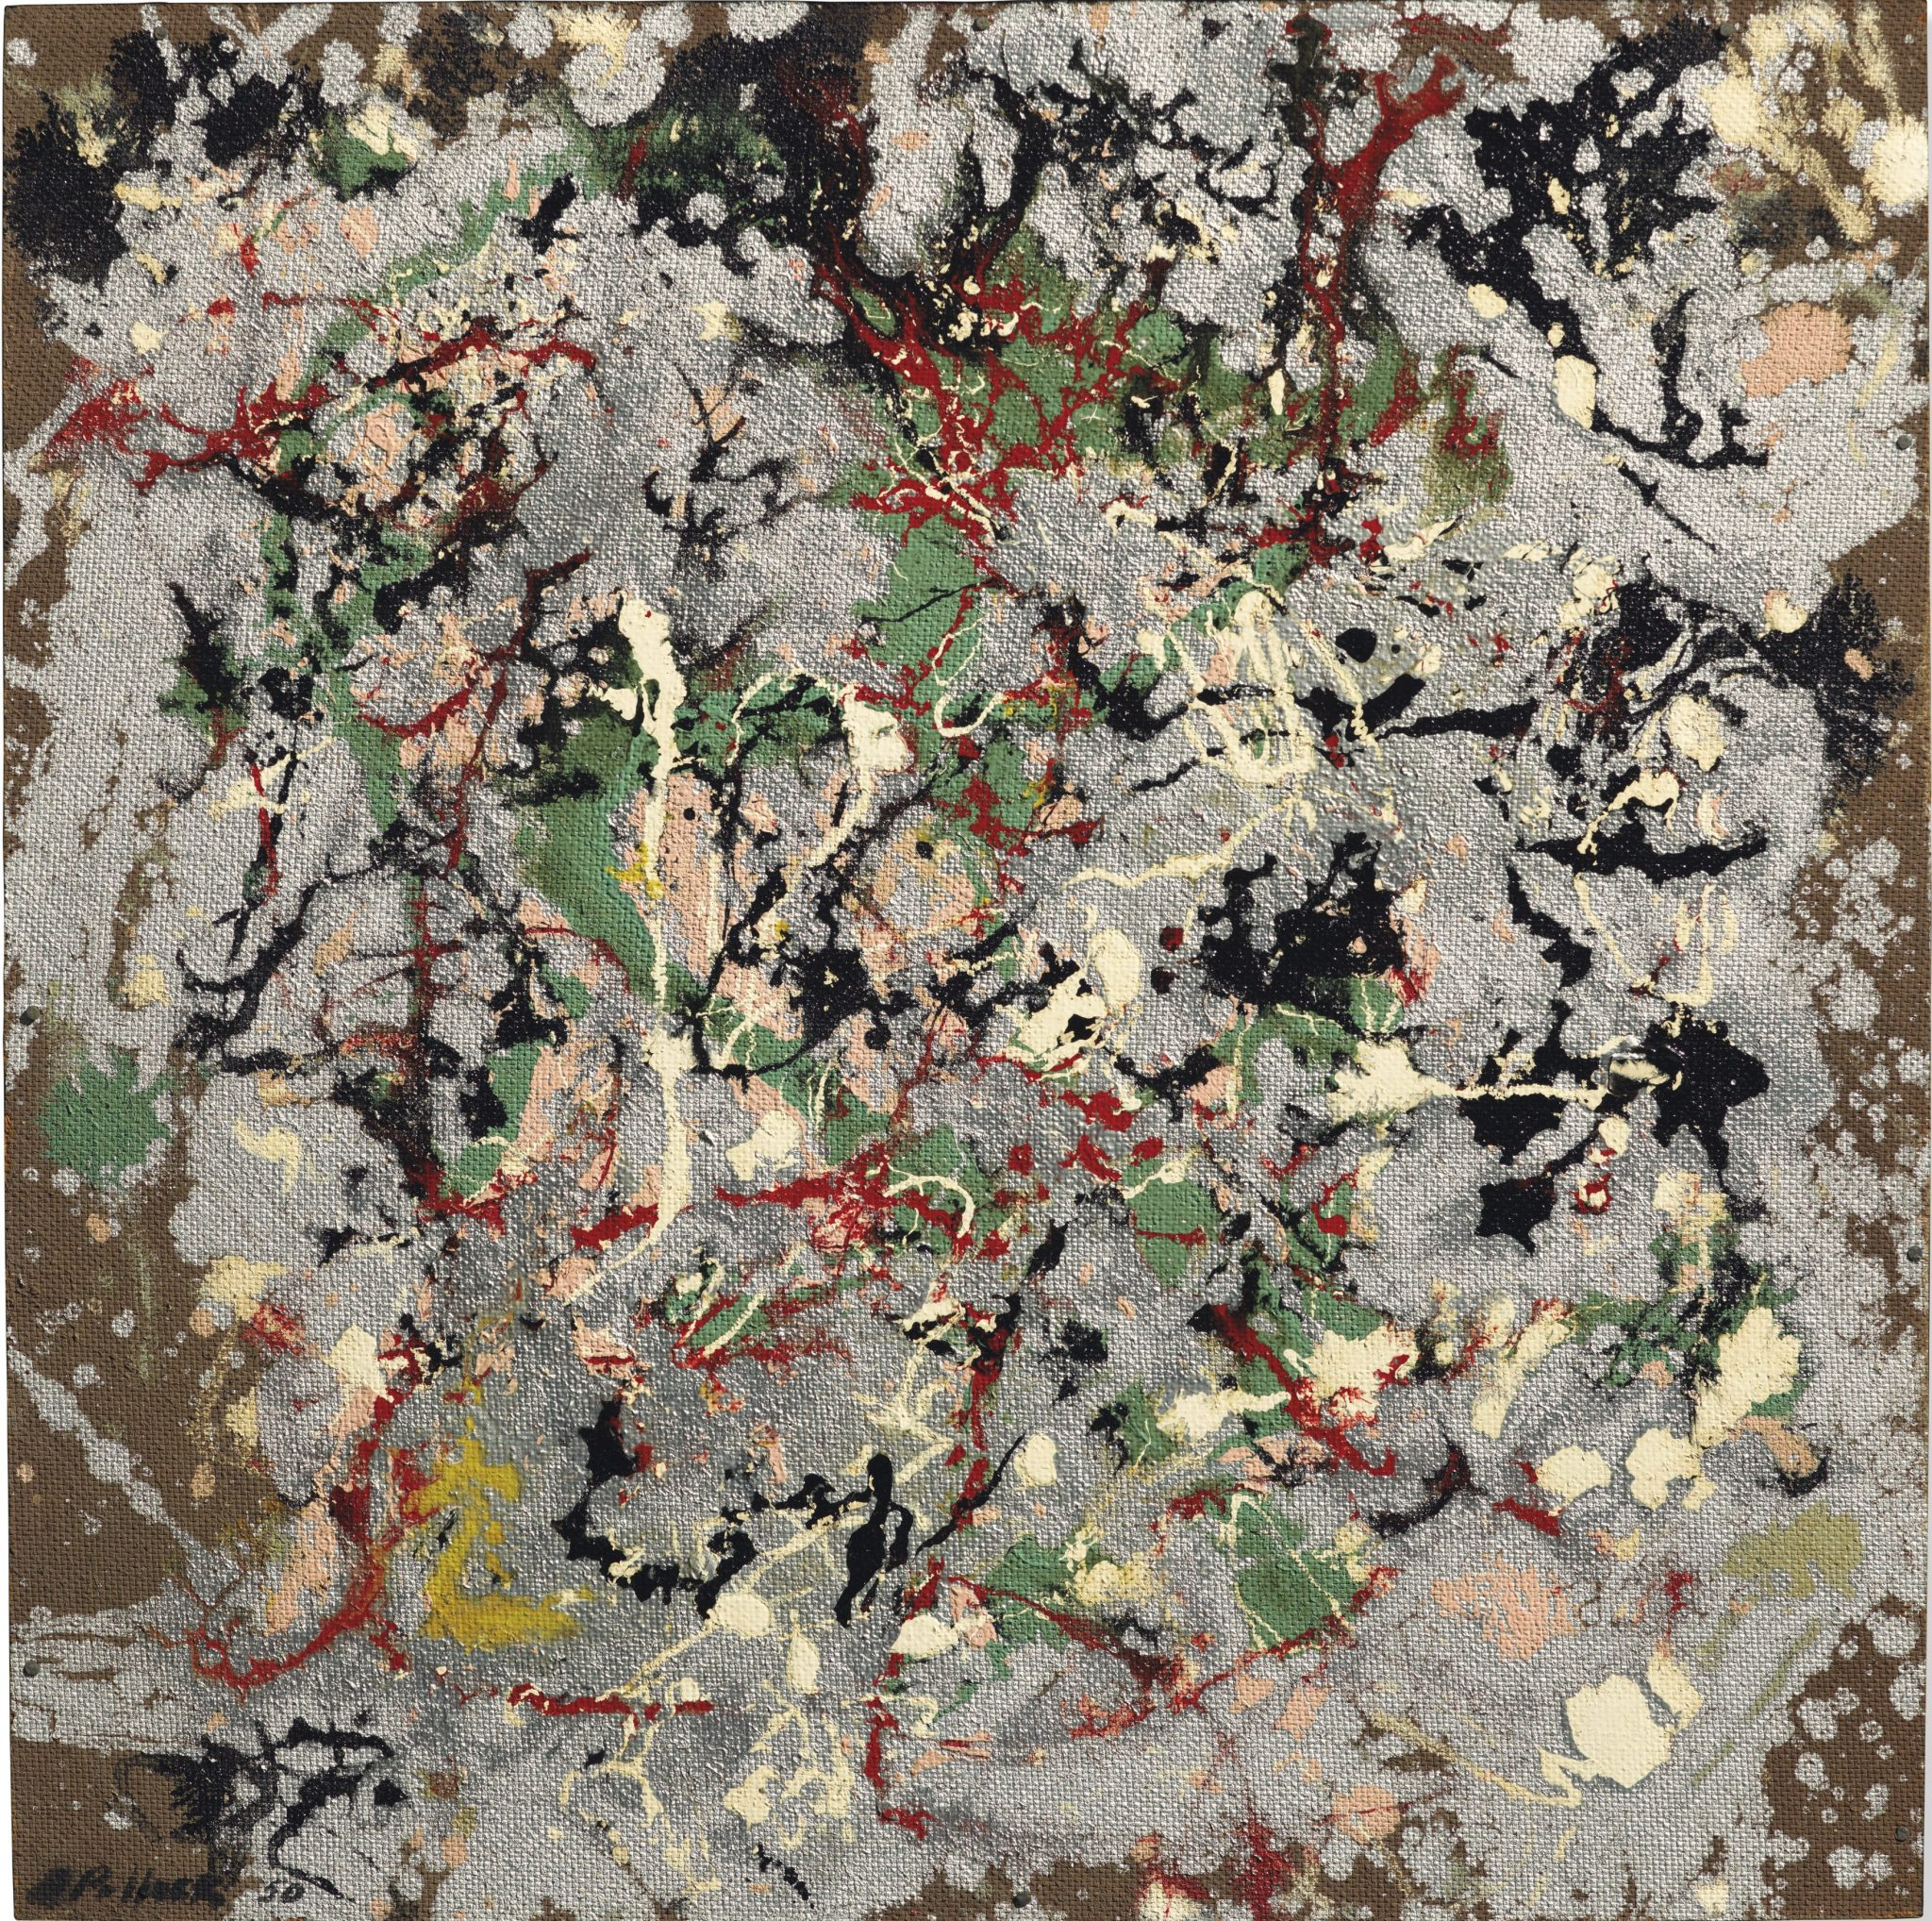 Jackson Pollock, Number 21, (1950), stima: £10,000,000-15,000,000